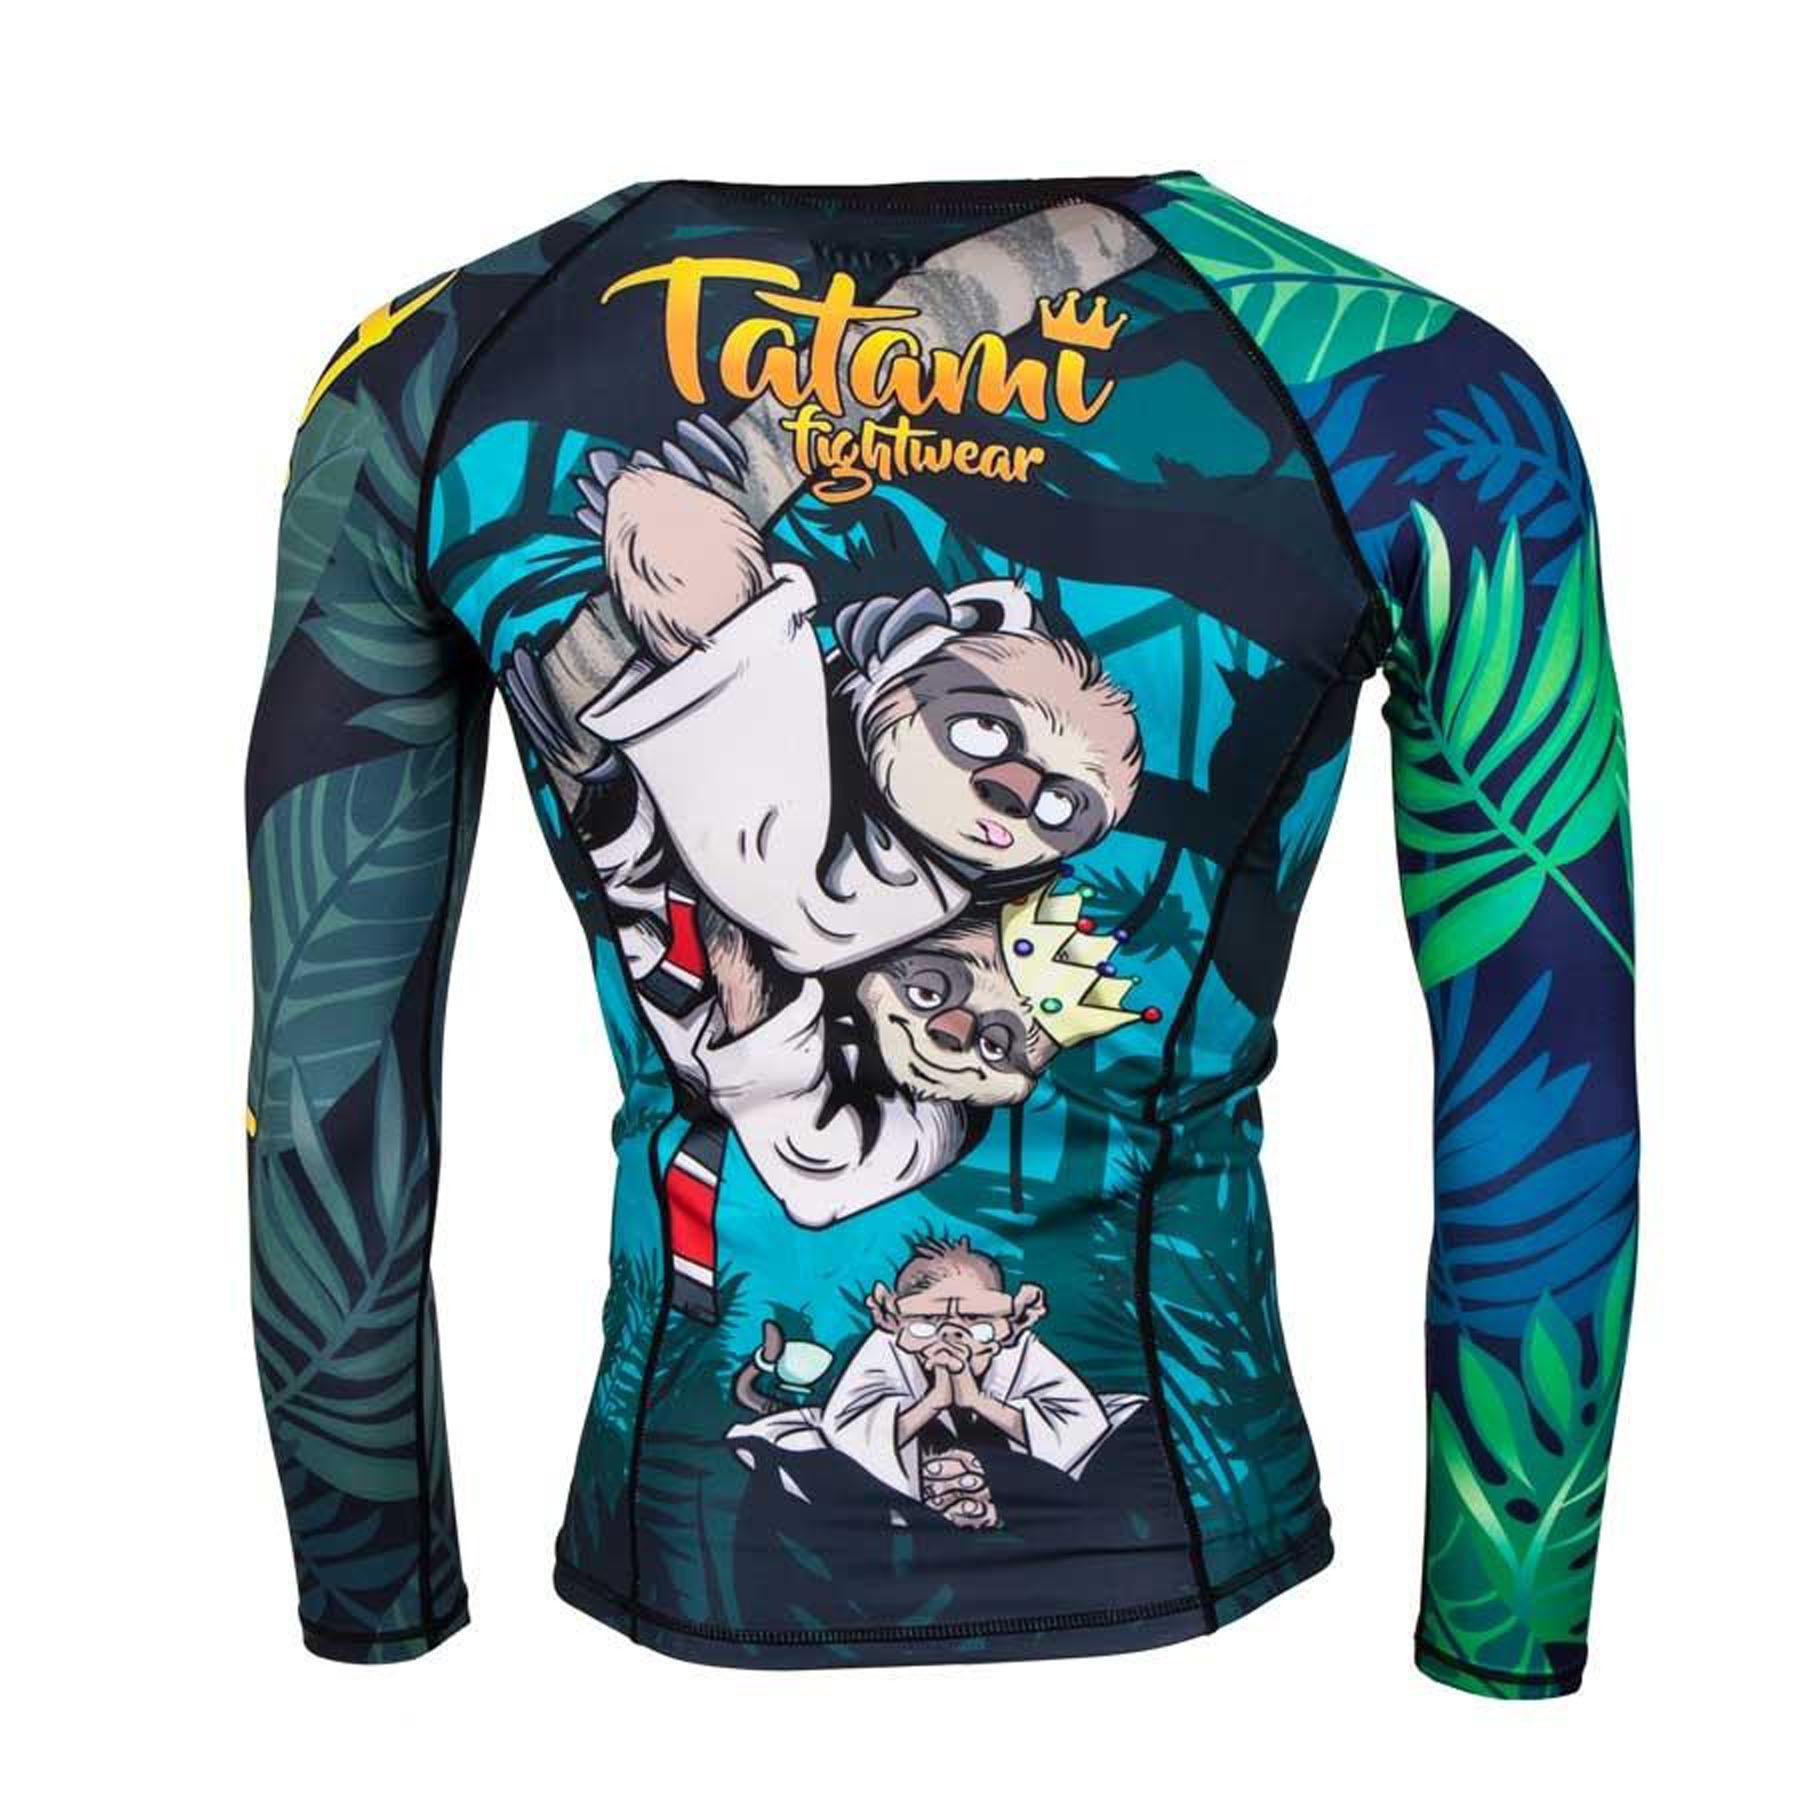 Tatami Fightwear Gorilla BJJ Gi Chess para Hombre